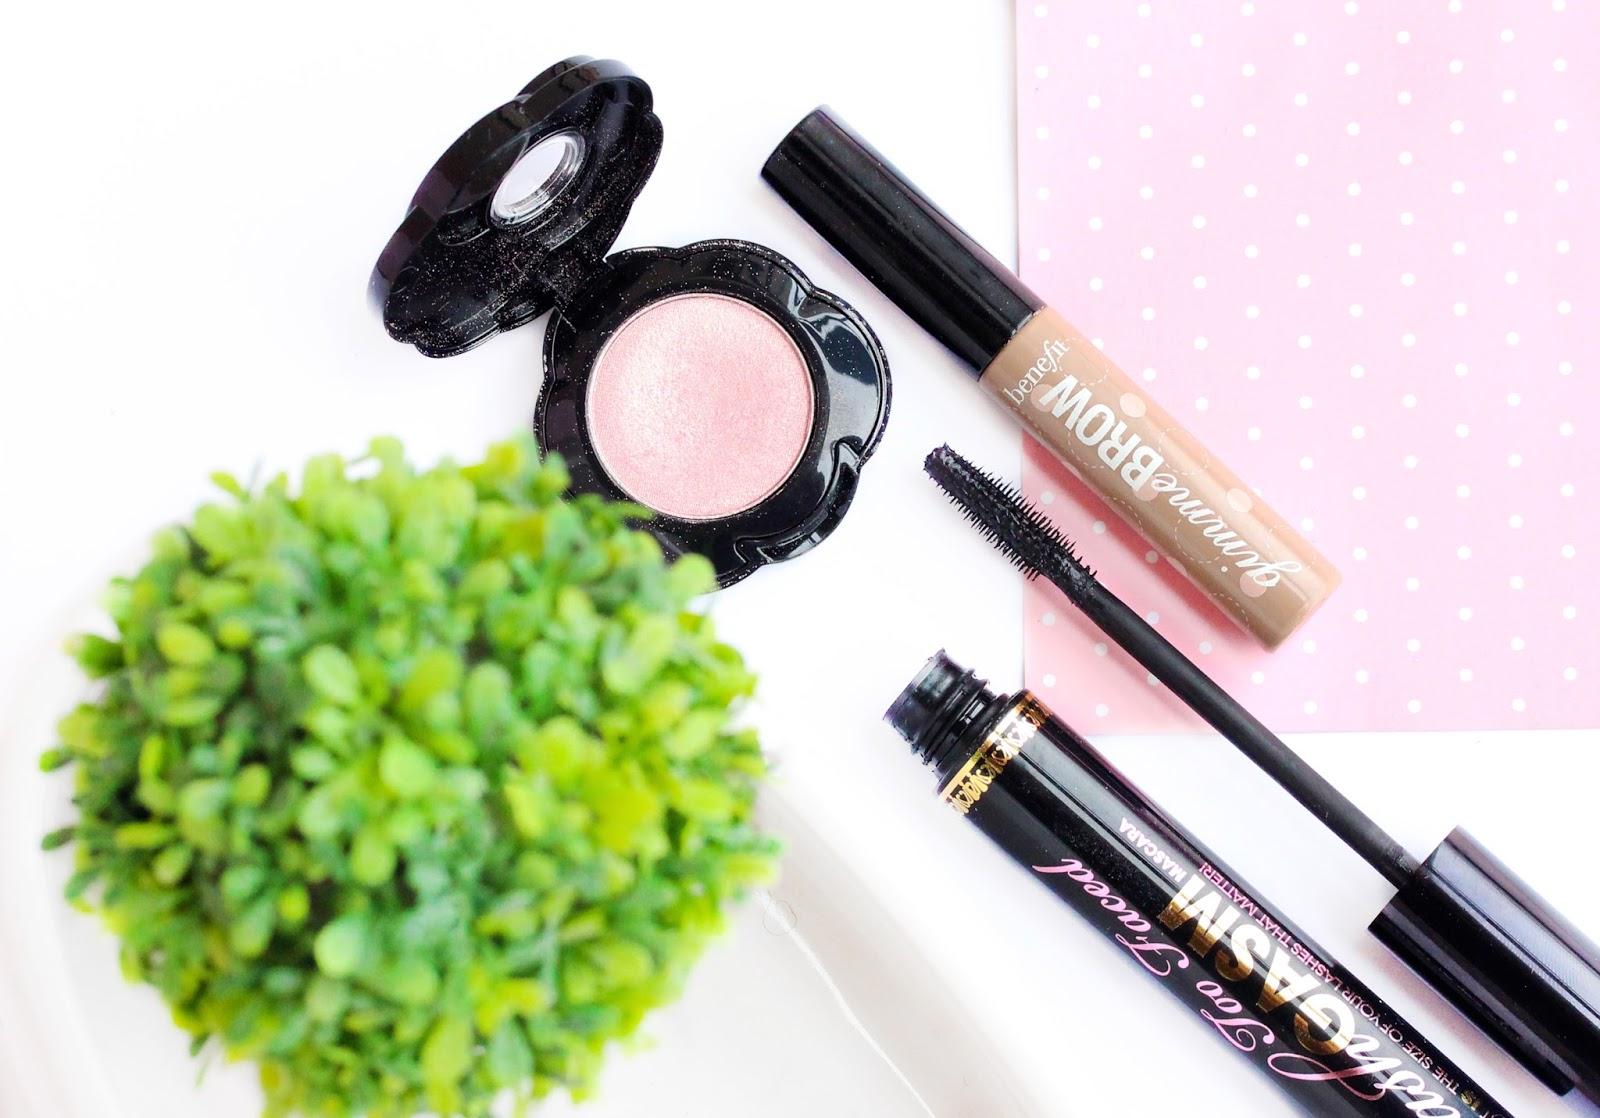 Minimal eye makeup products